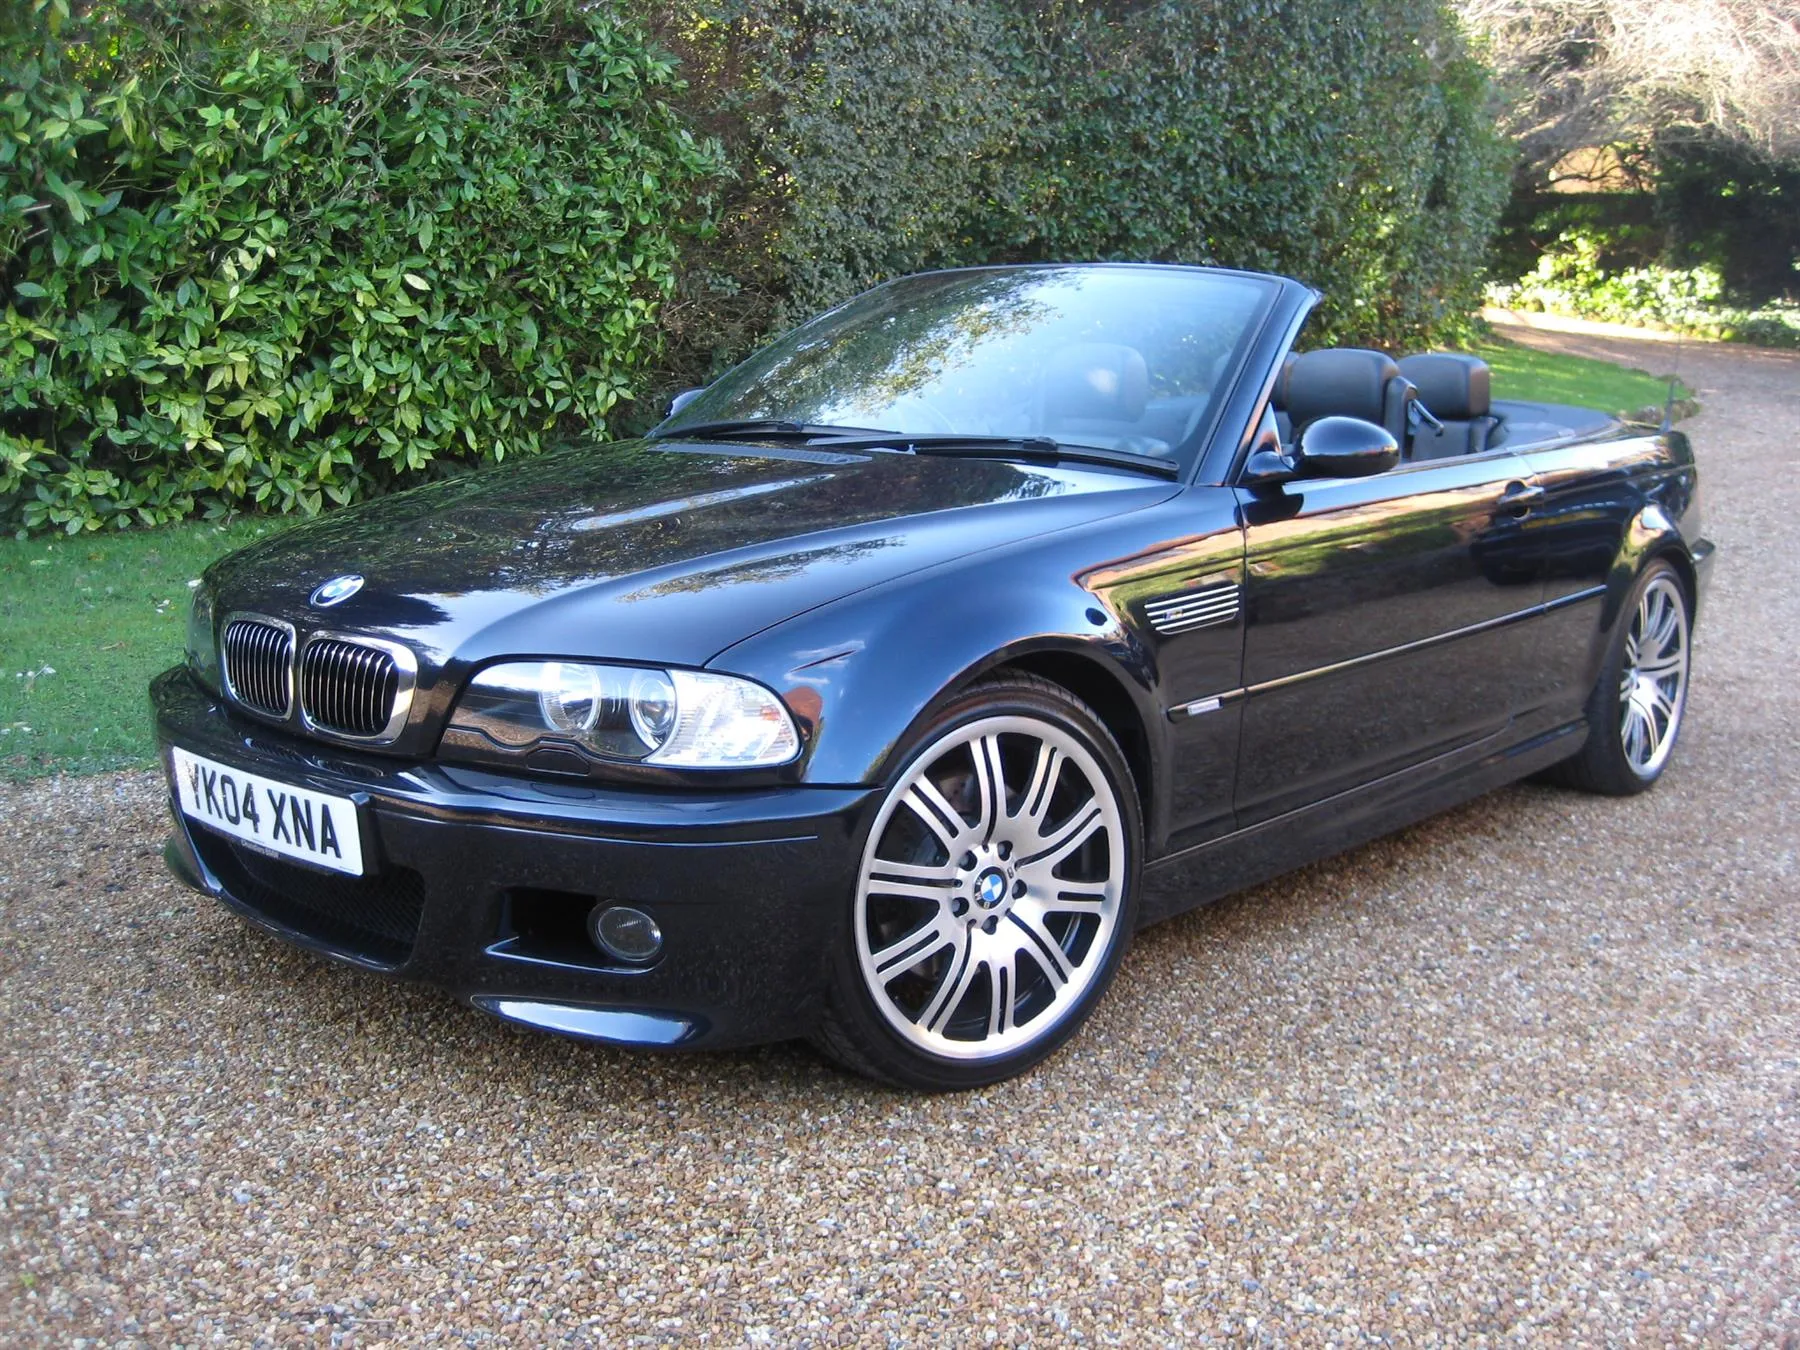 Used 2004 Black Bmw M3 E46 00 06 For Sale Pistonheads Uk